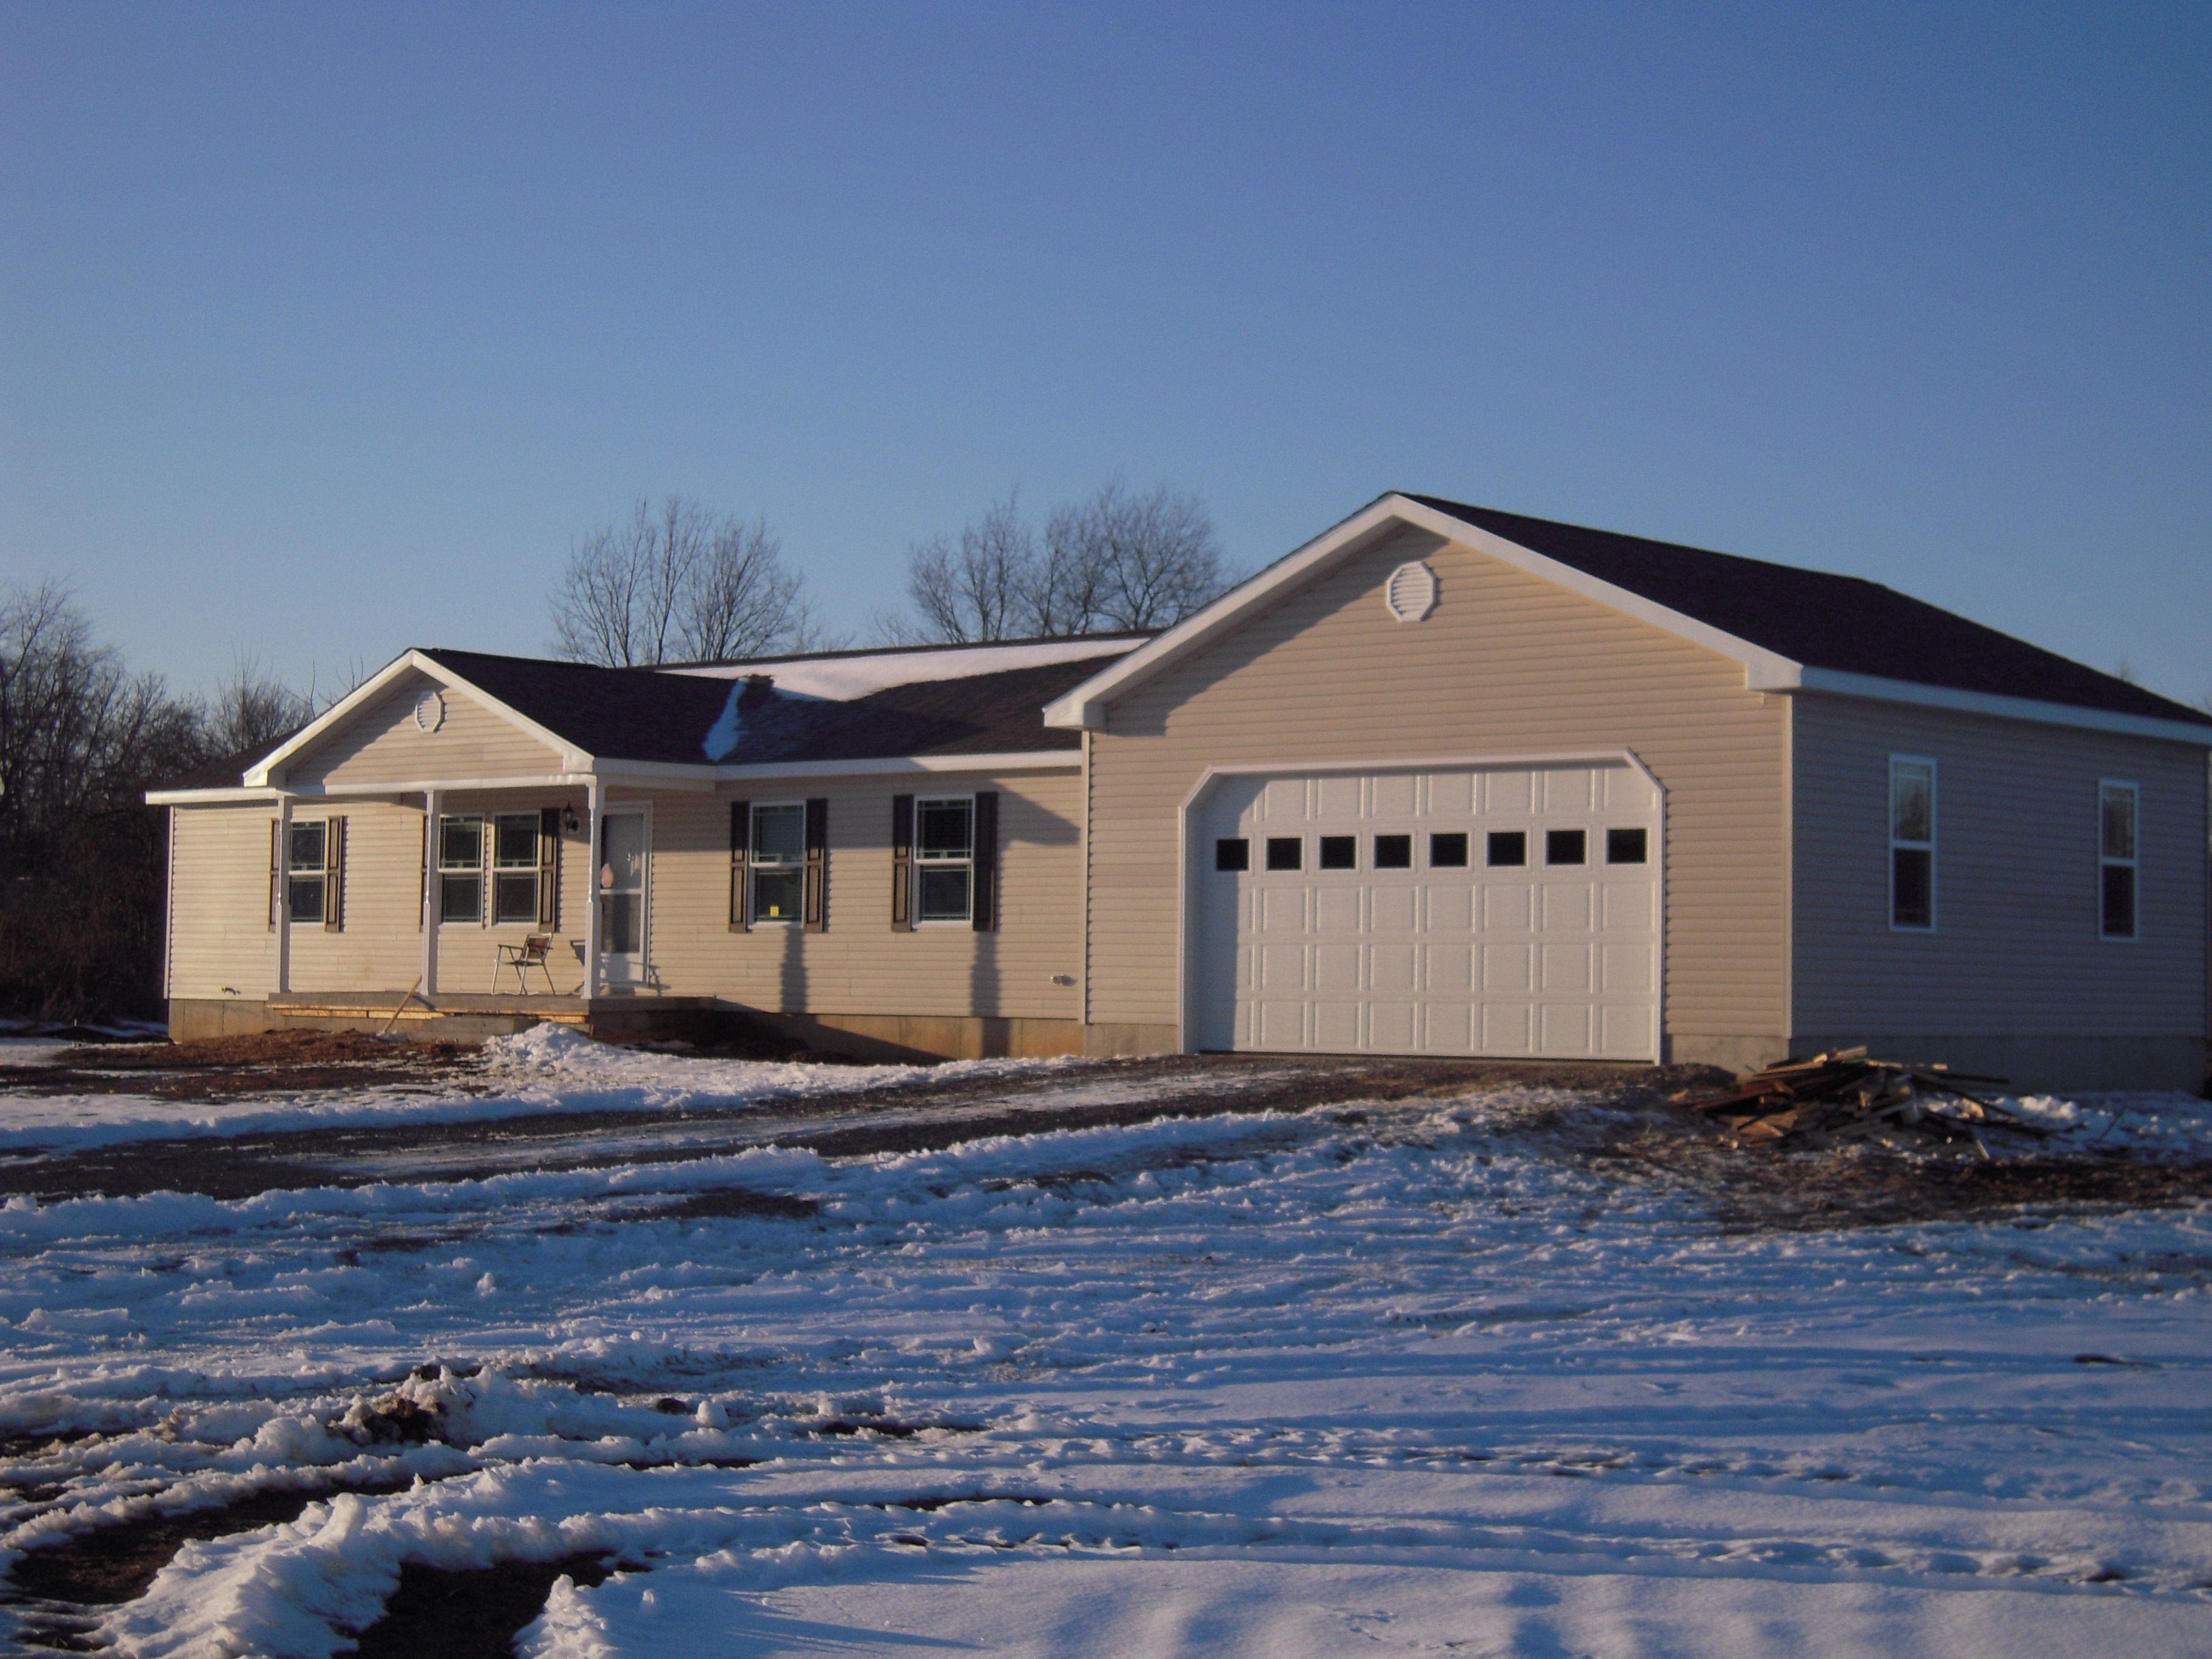 Modular Home Located In Scio Township, MI. This Beautiful